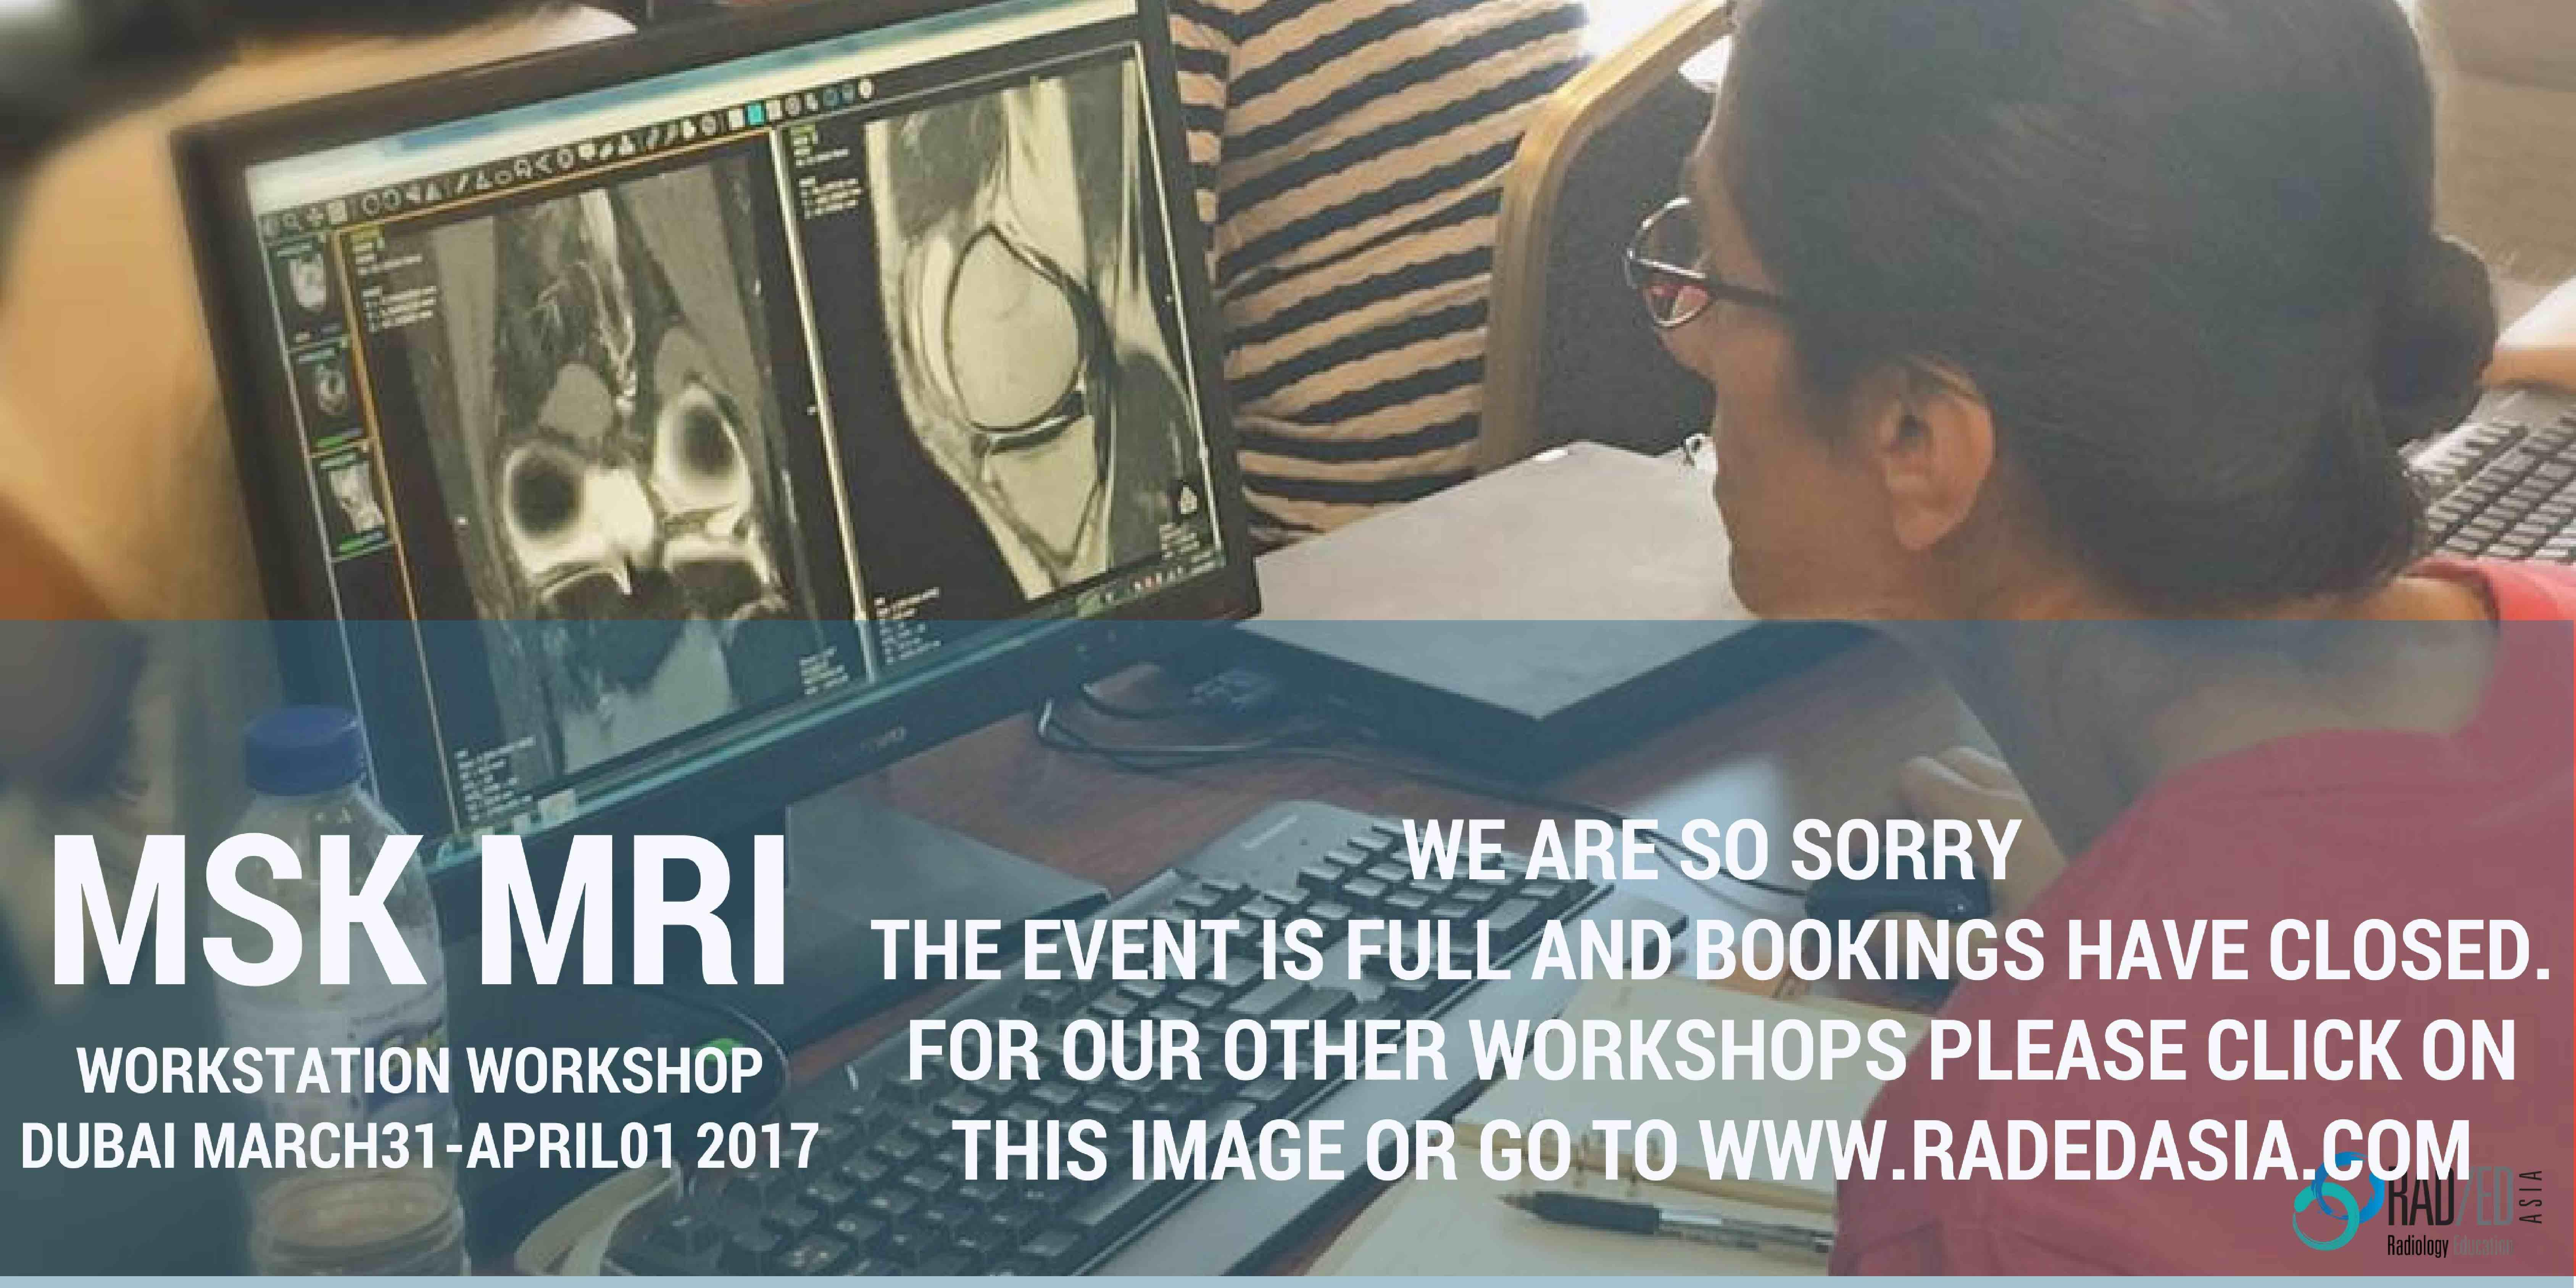 dubai radiology conference msk mri